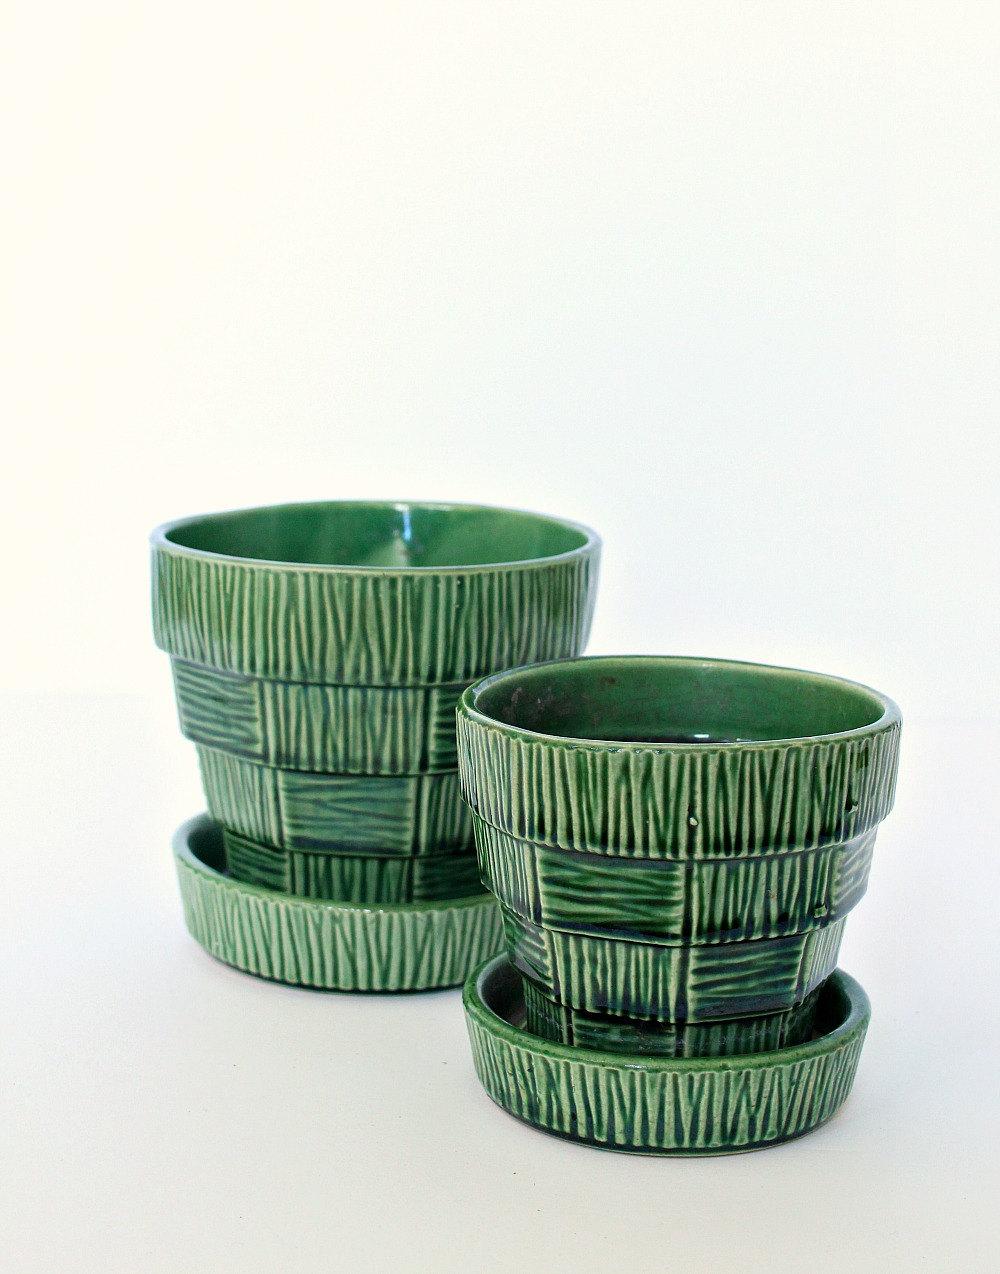 Green Basket Weave McCoy Pottery Planter